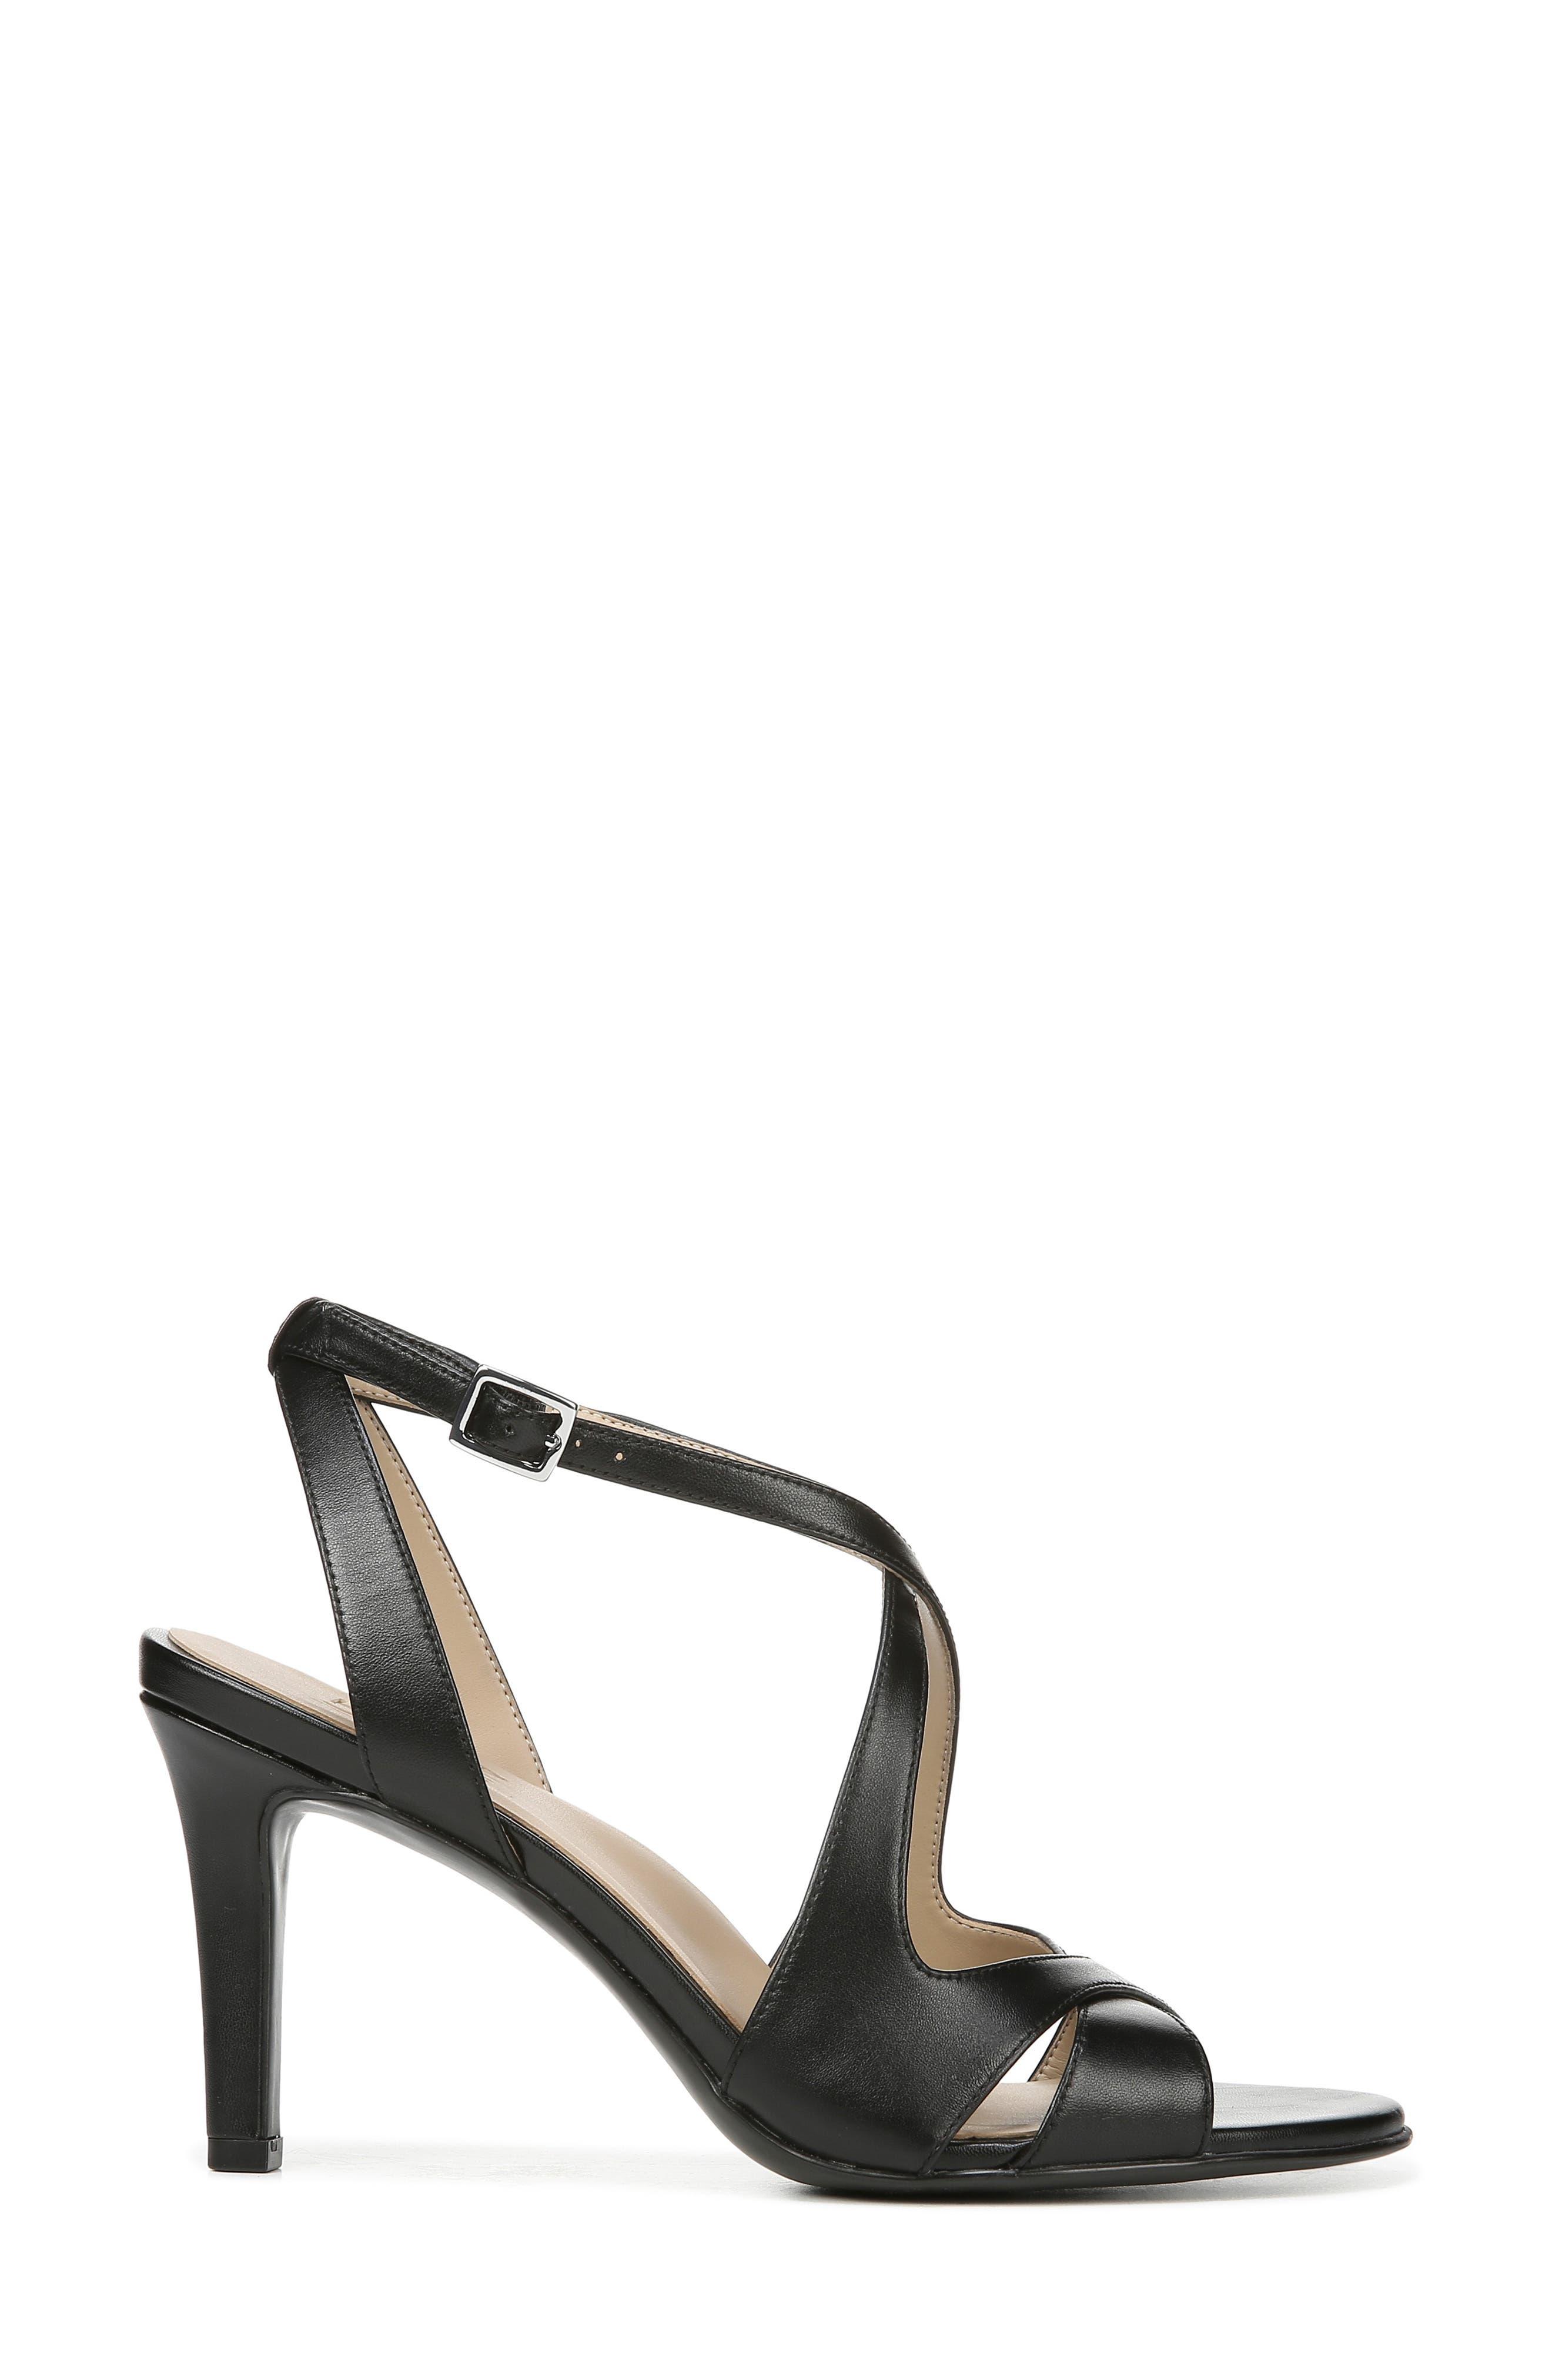 NATURALIZER, Klein Strappy Sandal, Alternate thumbnail 3, color, BLACK LEATHER